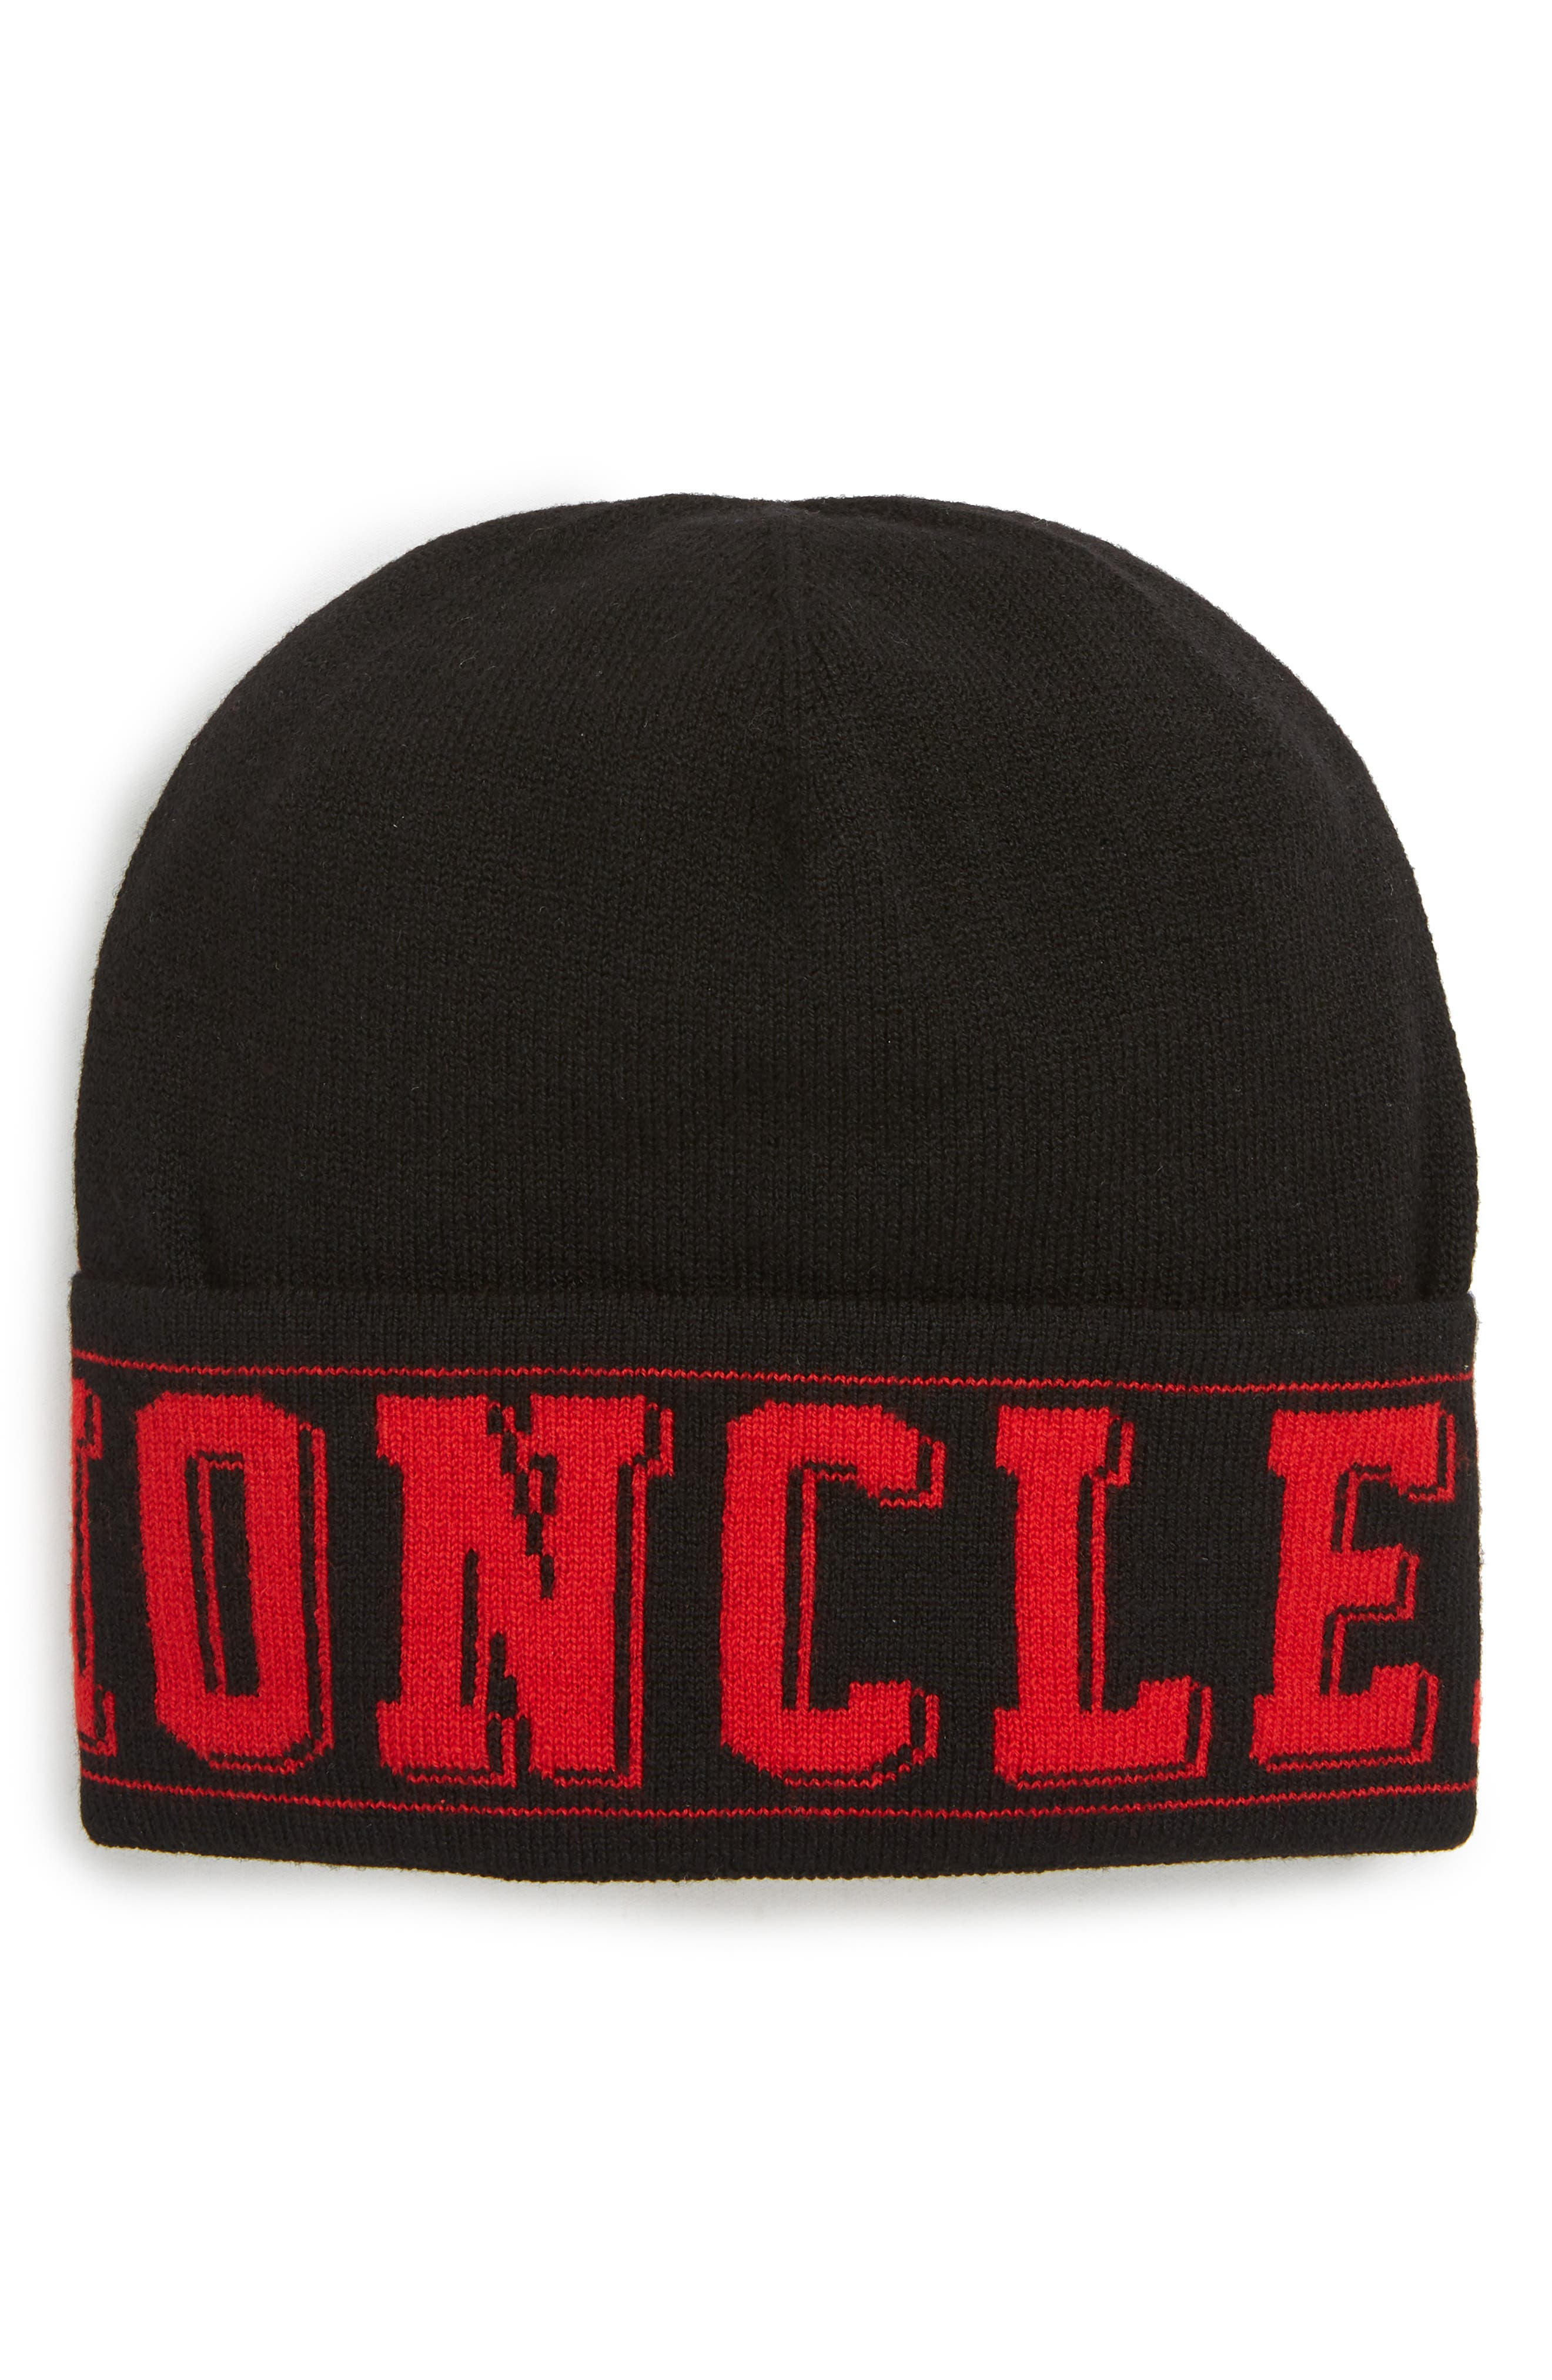 aa287d2a07c ... hats b9a9a 24a4c  wholesale moncler berretto logo wool beanie 7481d  f215e